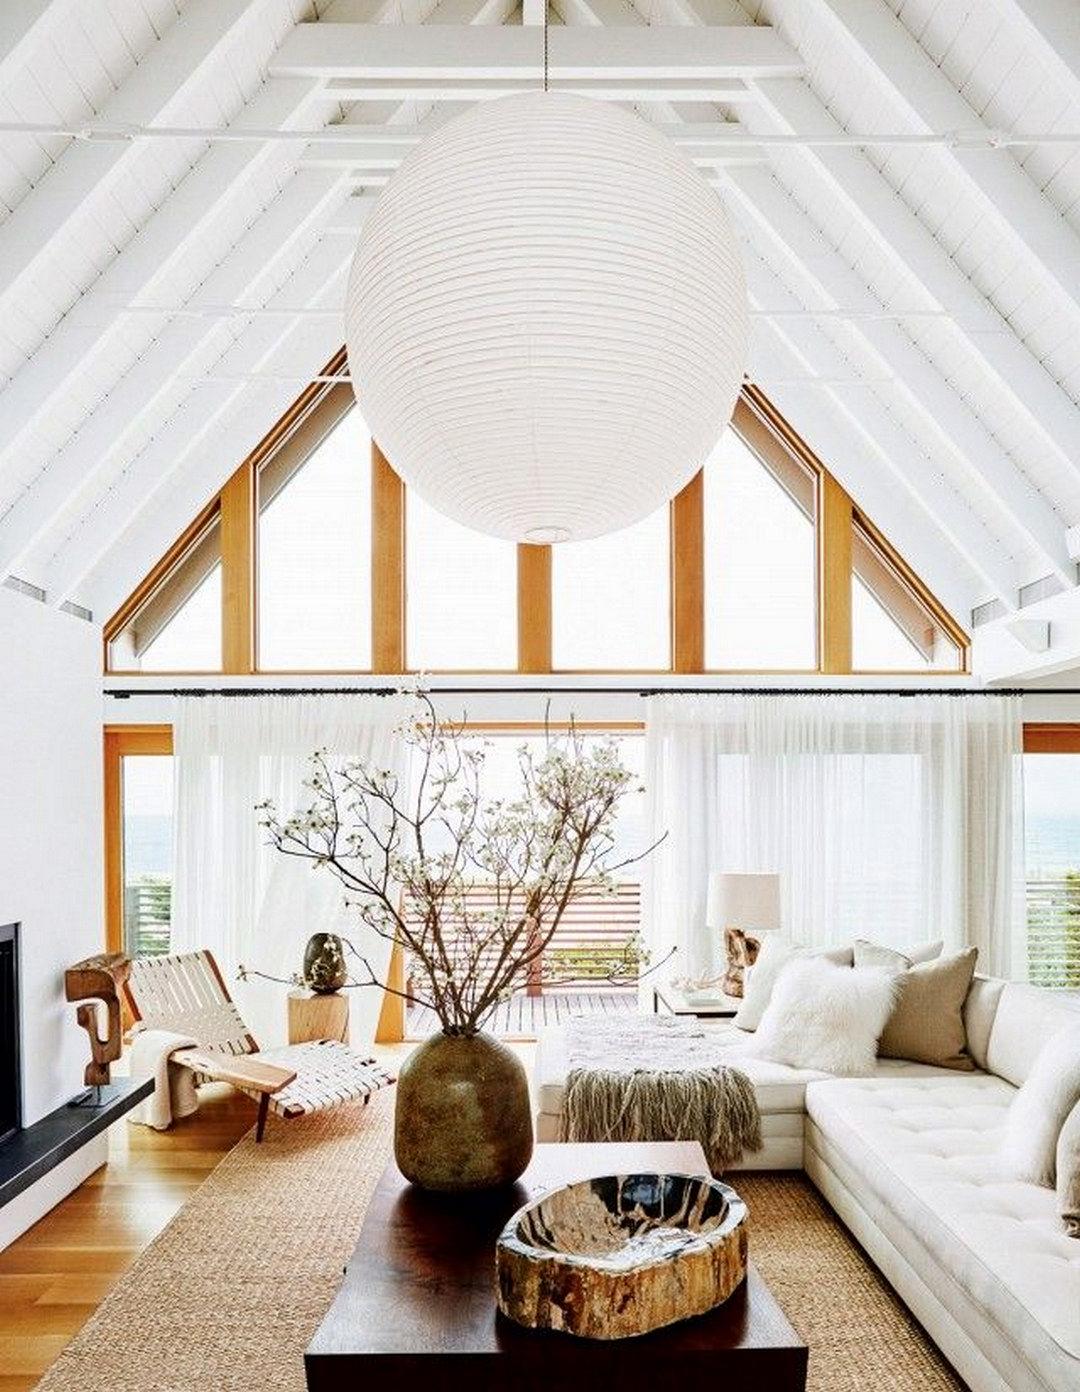 17 Stunning Interior Design Ideas For Living Room Beach House Living Room Dreamy Living Room Beach House Interior